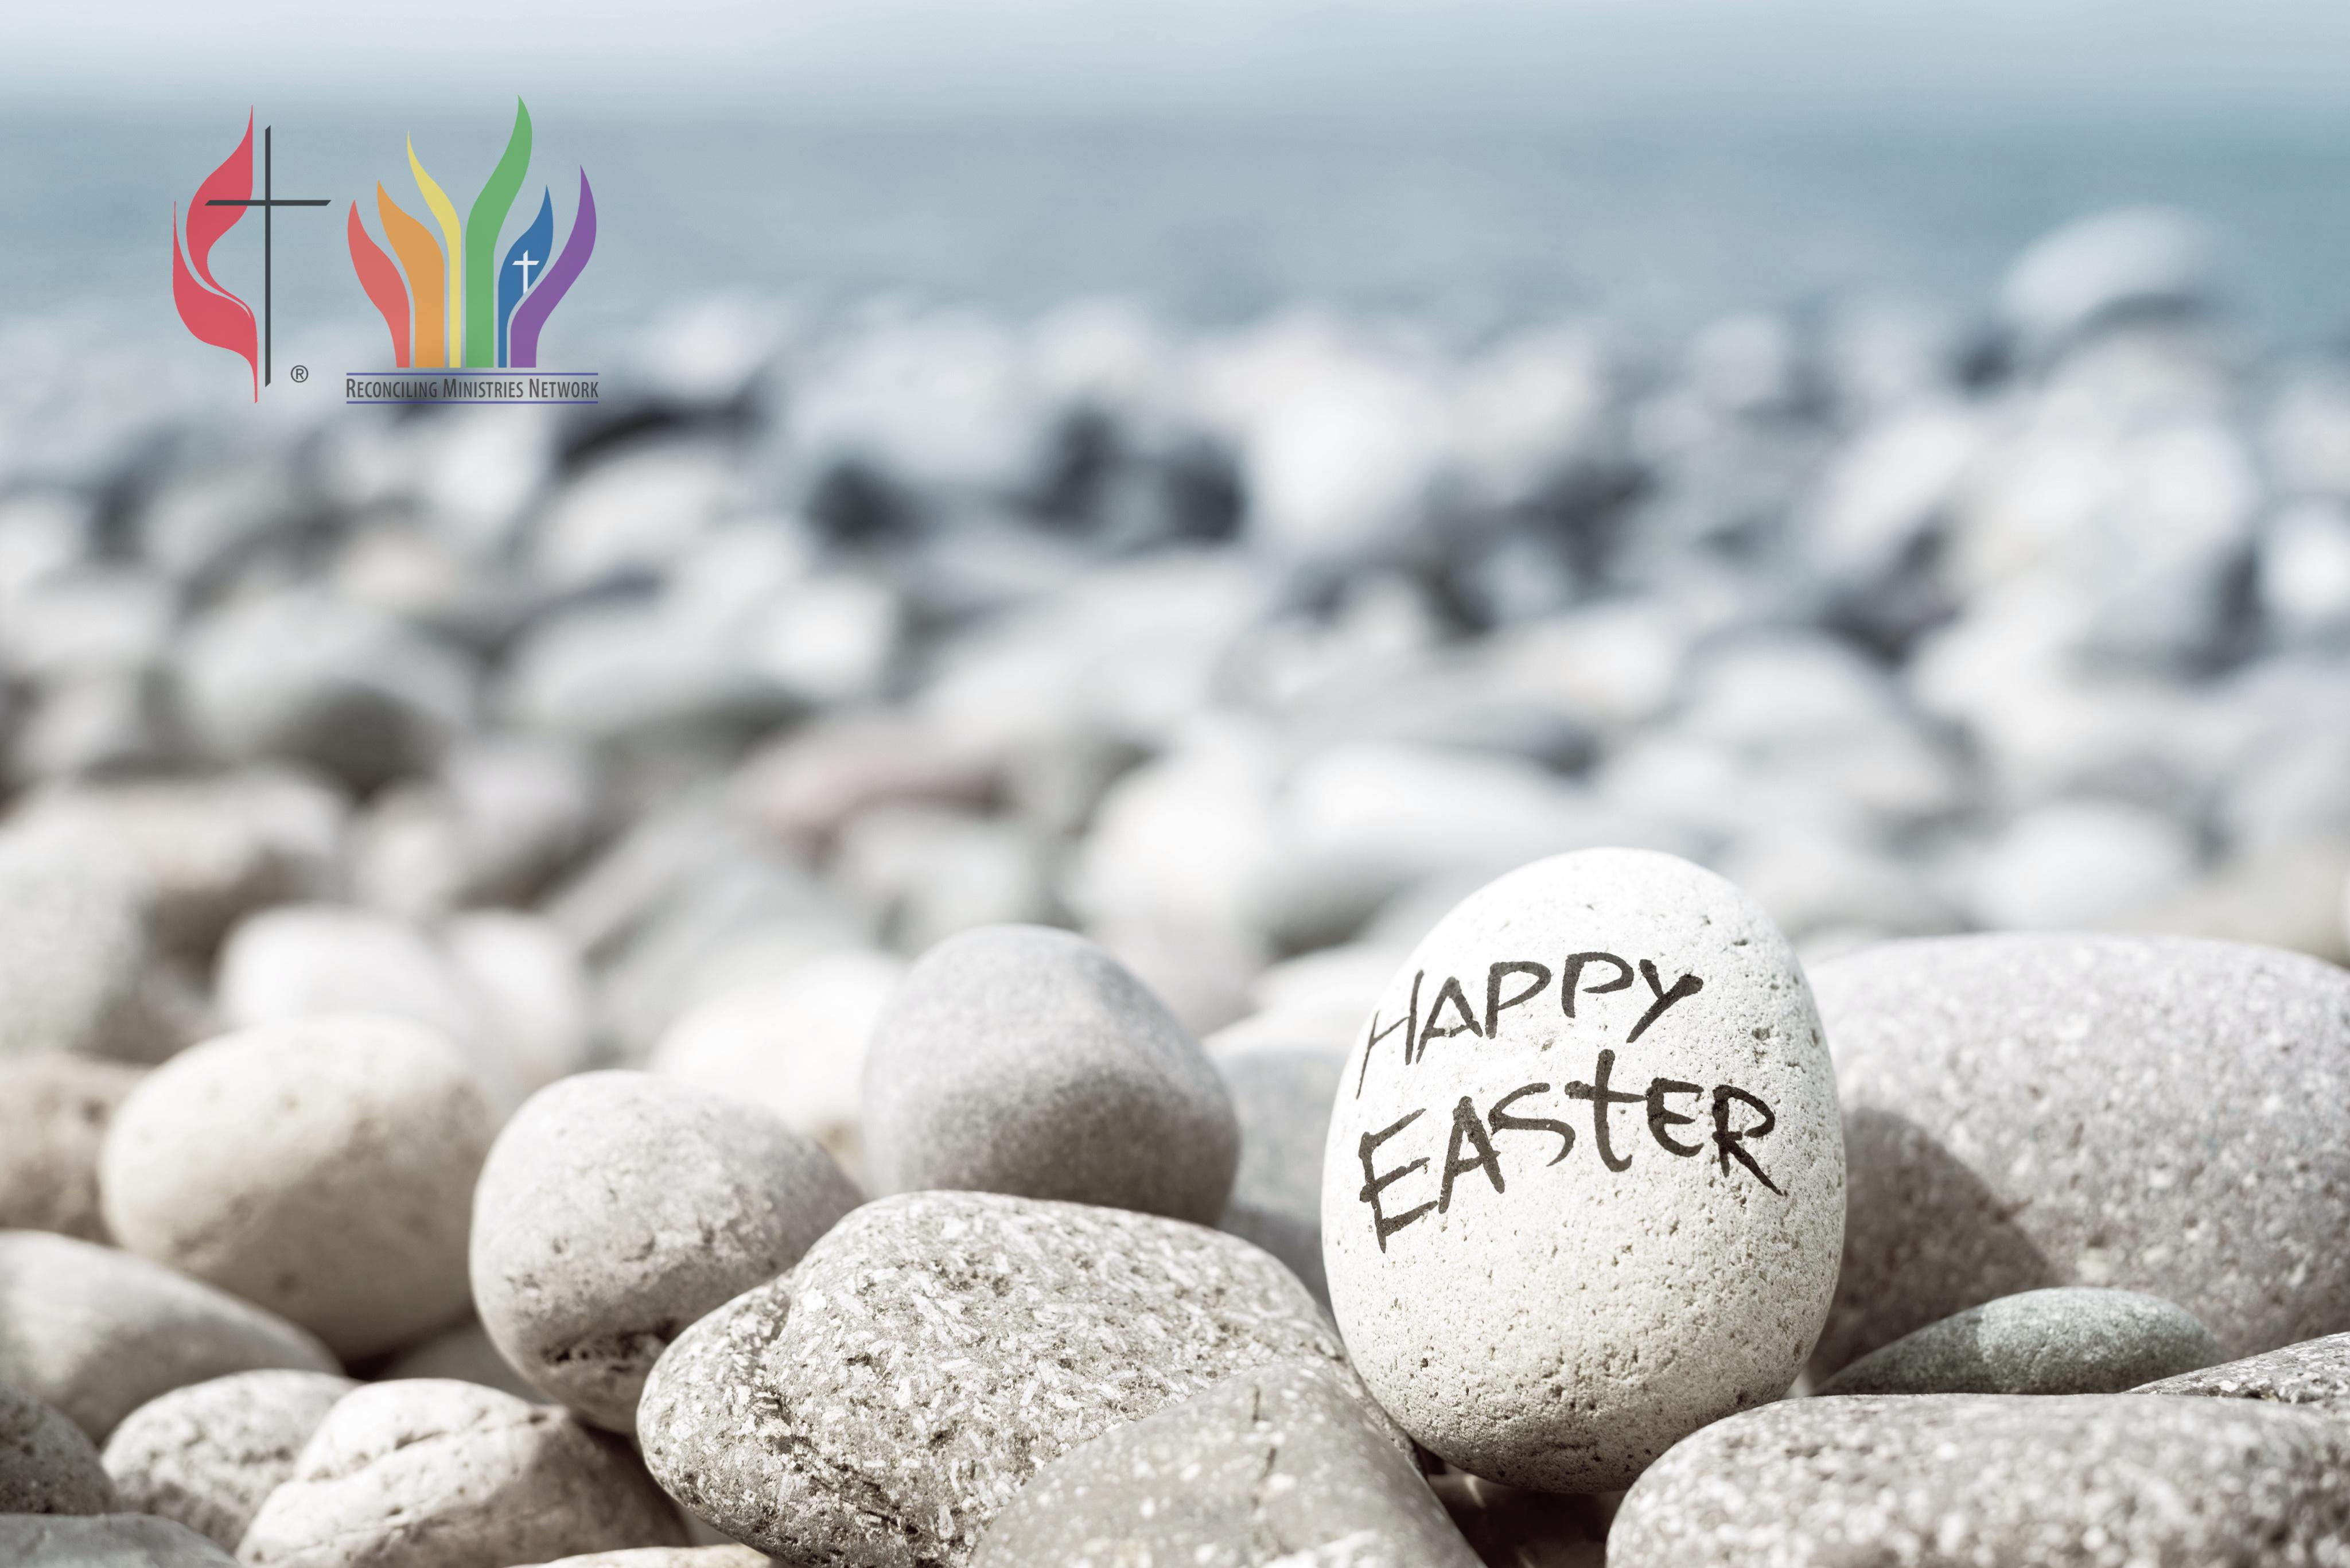 Rejoice on Easter Sunday